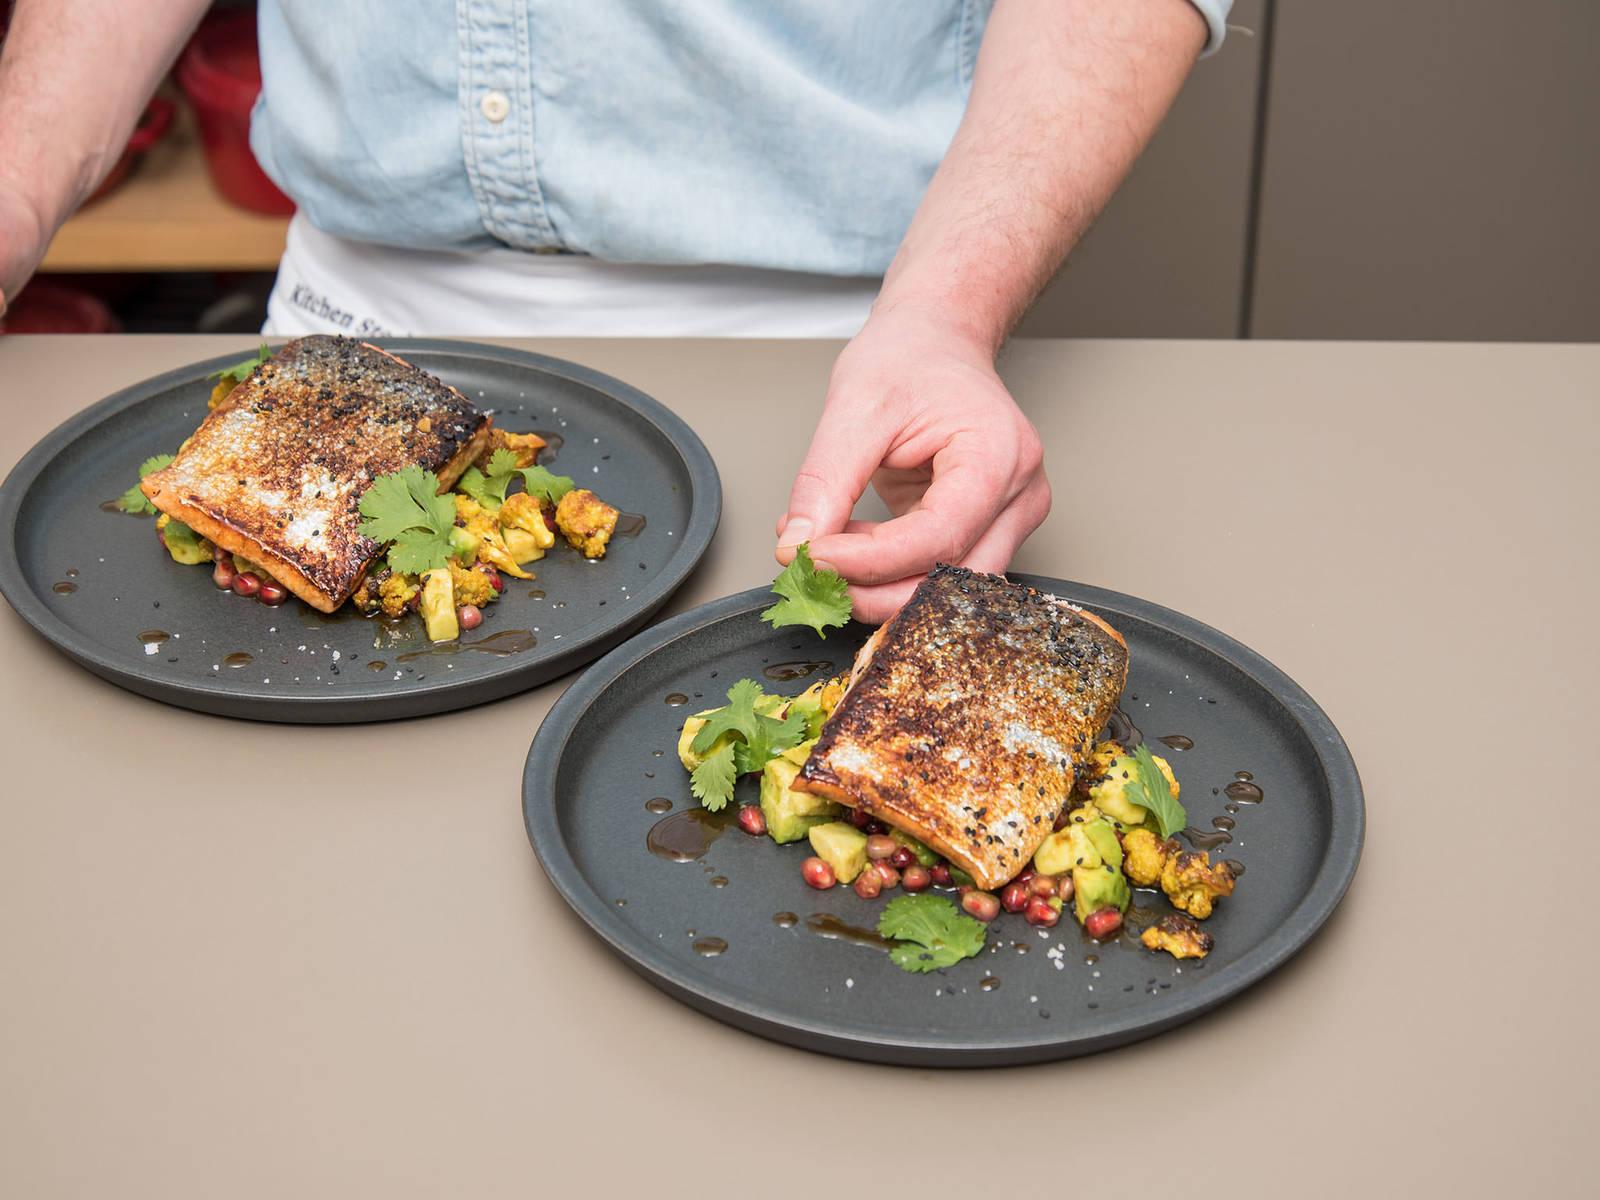 Serve salmon with avocado cauliflower salad. Garnish with black sesame seeds and chopped cilantro. Enjoy!